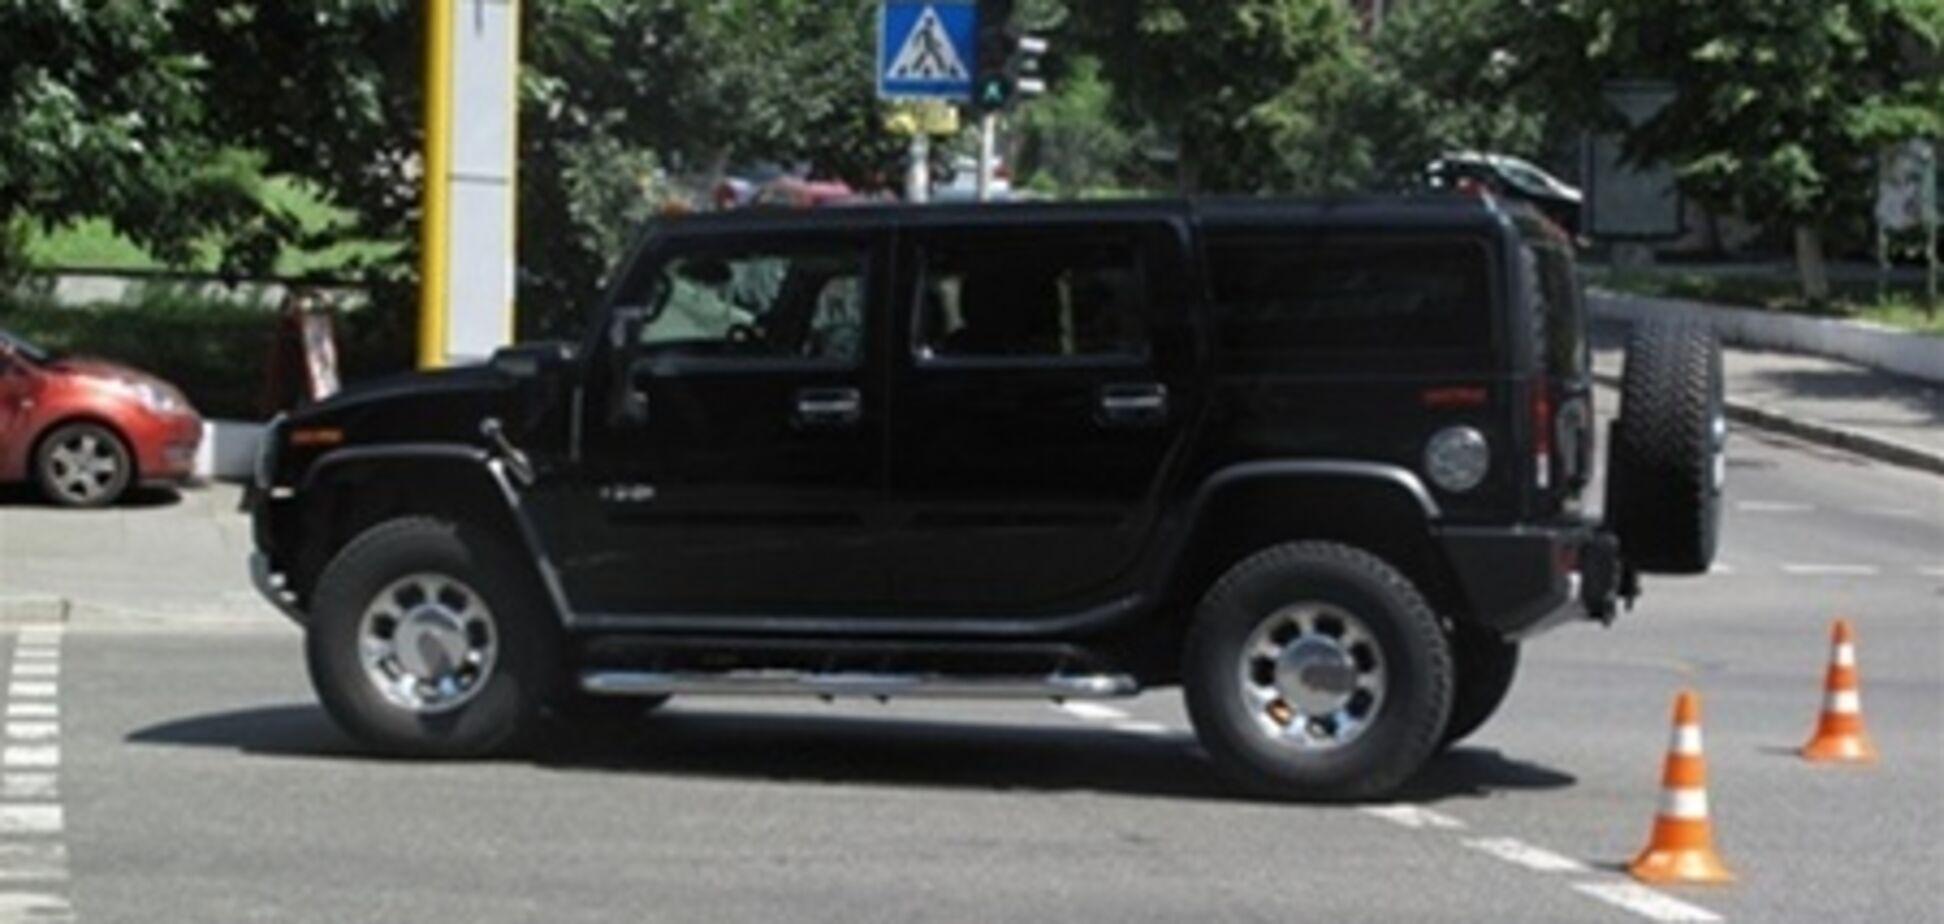 Семью дипломата в Киеве сбил Hummer дочери нардепа - СМИ